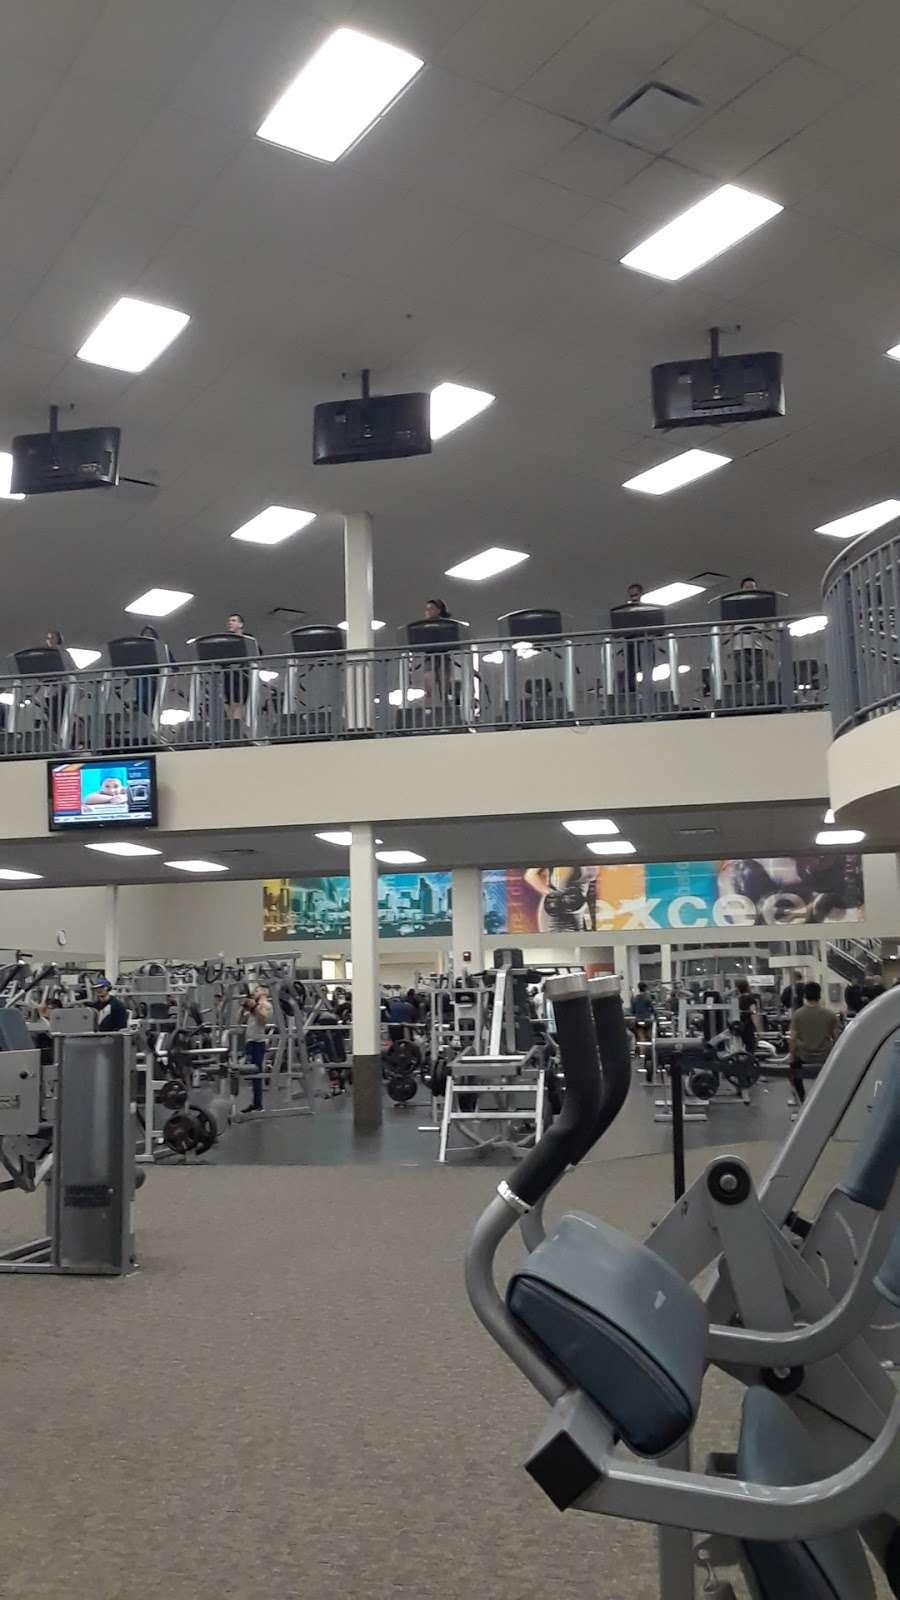 LA Fitness - gym  | Photo 7 of 10 | Address: 452 Lakehurst Rd, Waukegan, IL 60085, USA | Phone: (224) 399-0990